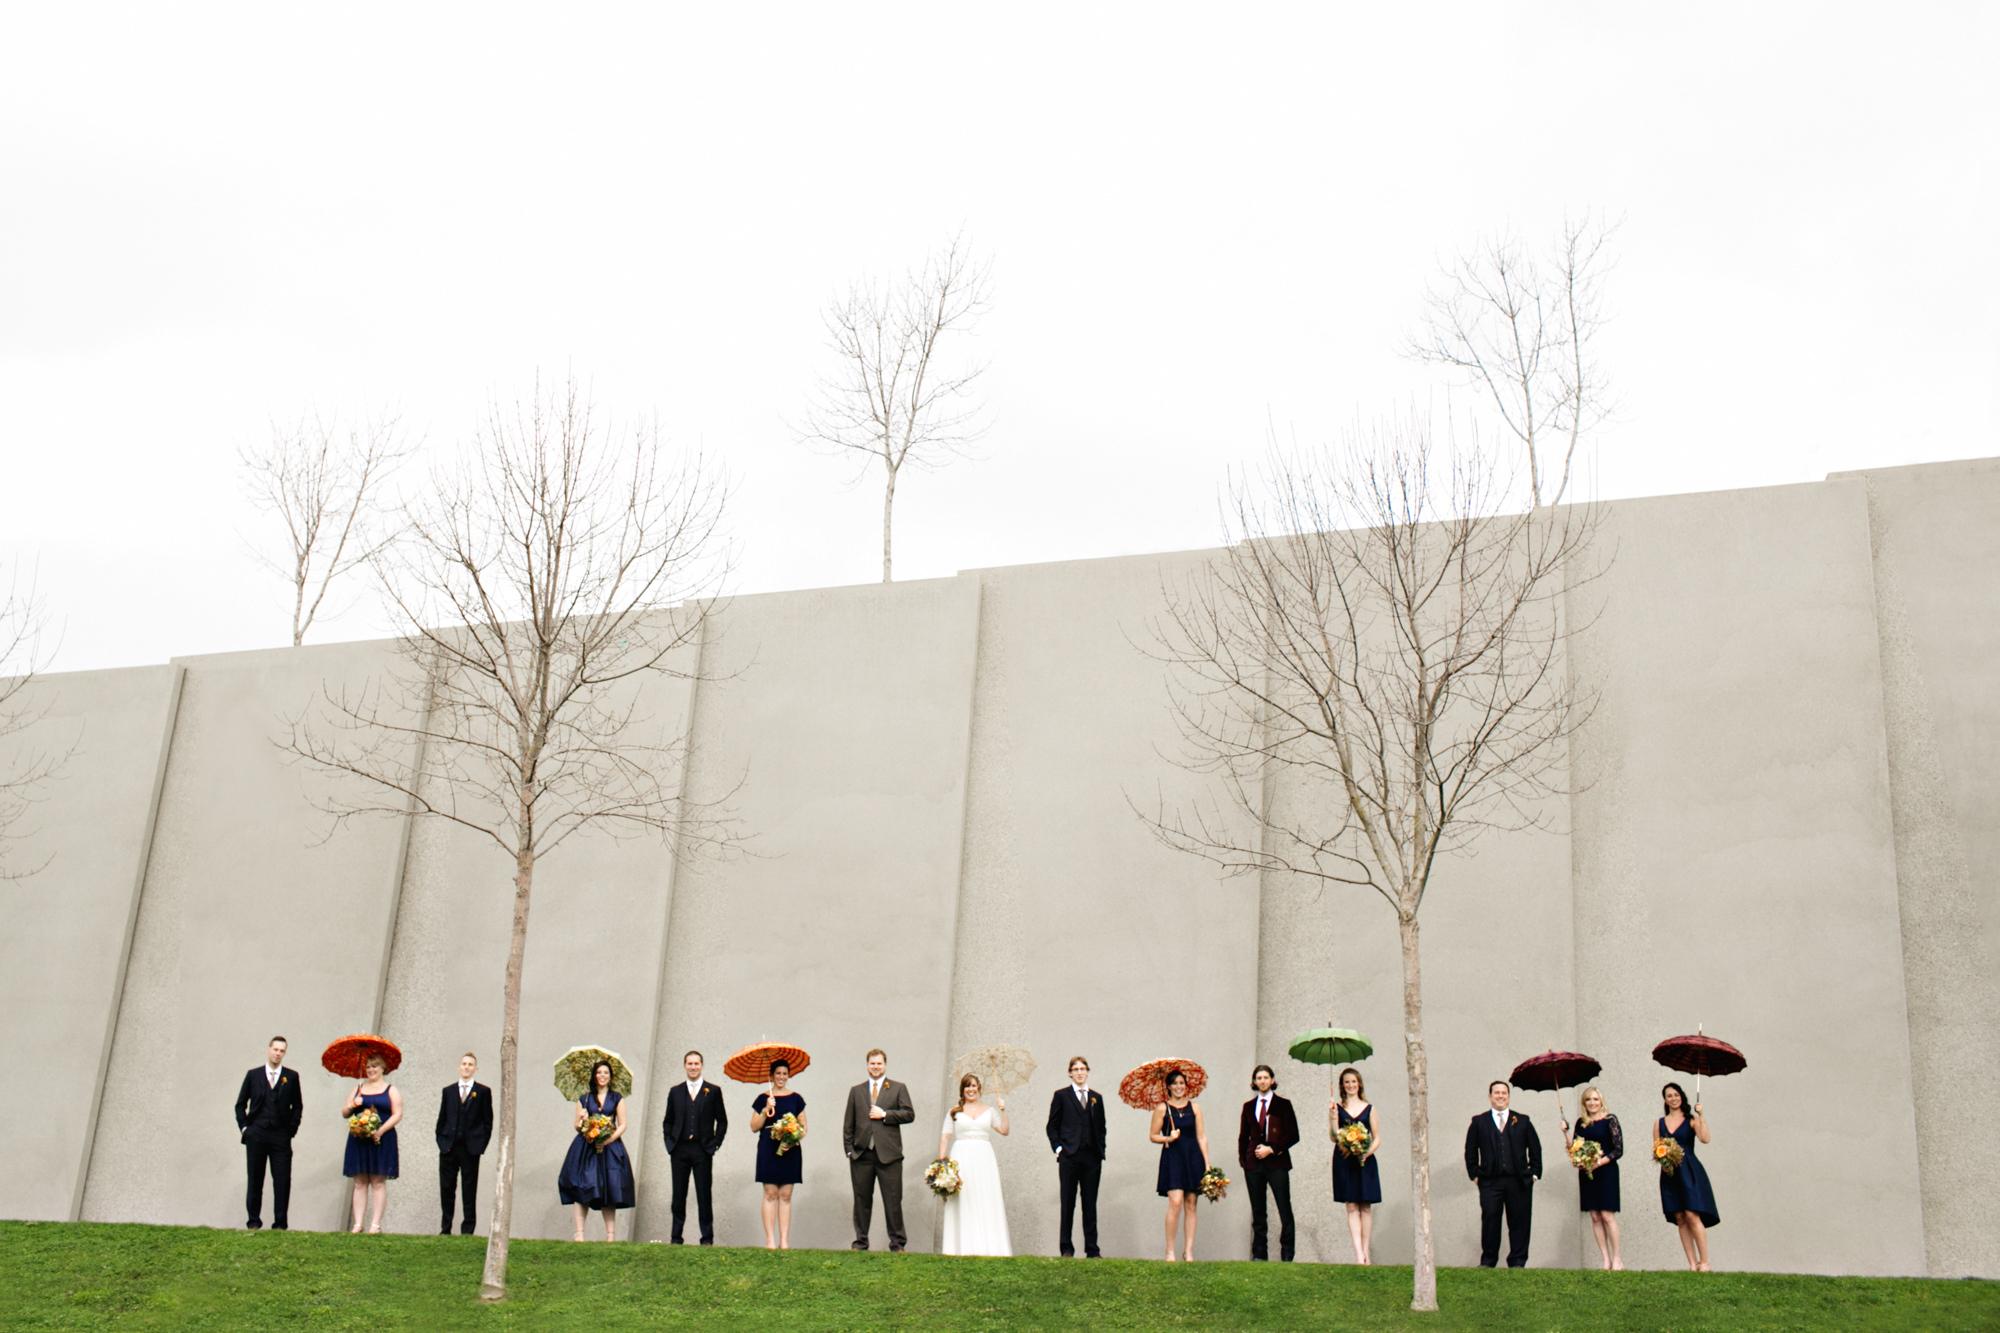 fun-bridal-party-group-portrait-Seattle-olympic-sculpture-garden-jenny-jimenez-seattle-wedding-photographers